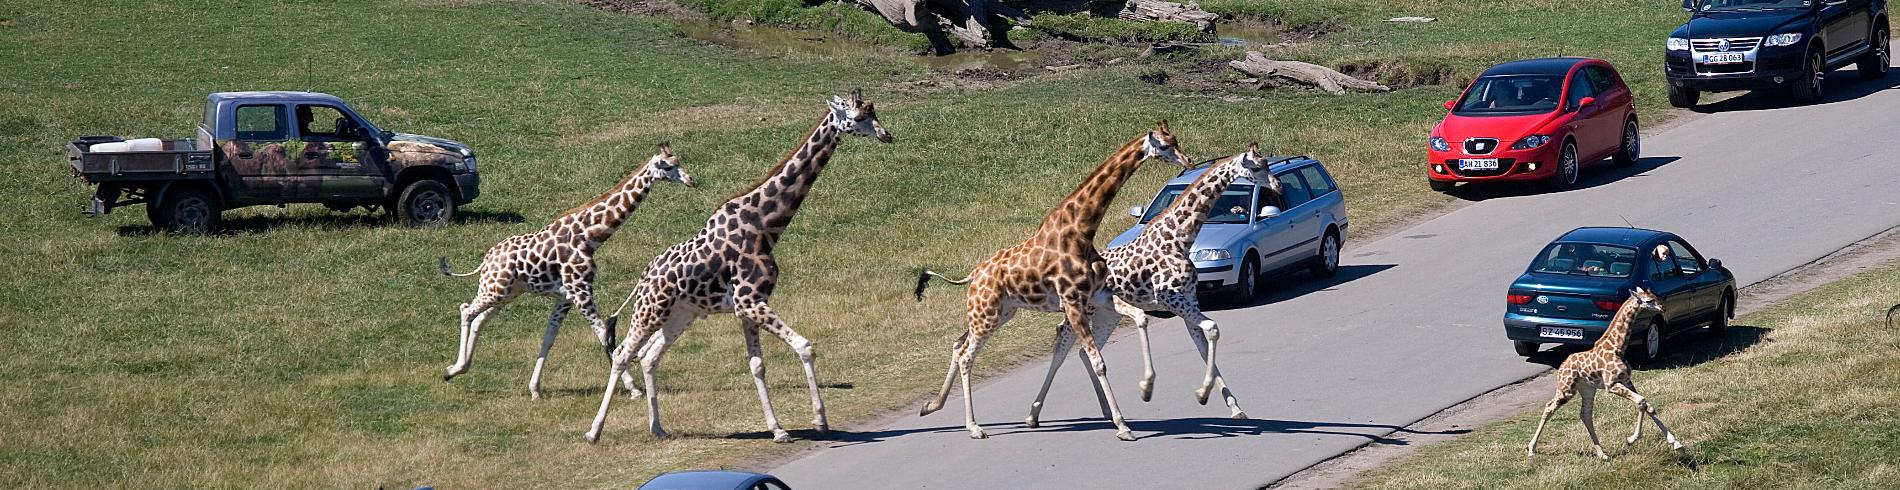 Knuthenborg Safaripark cover image